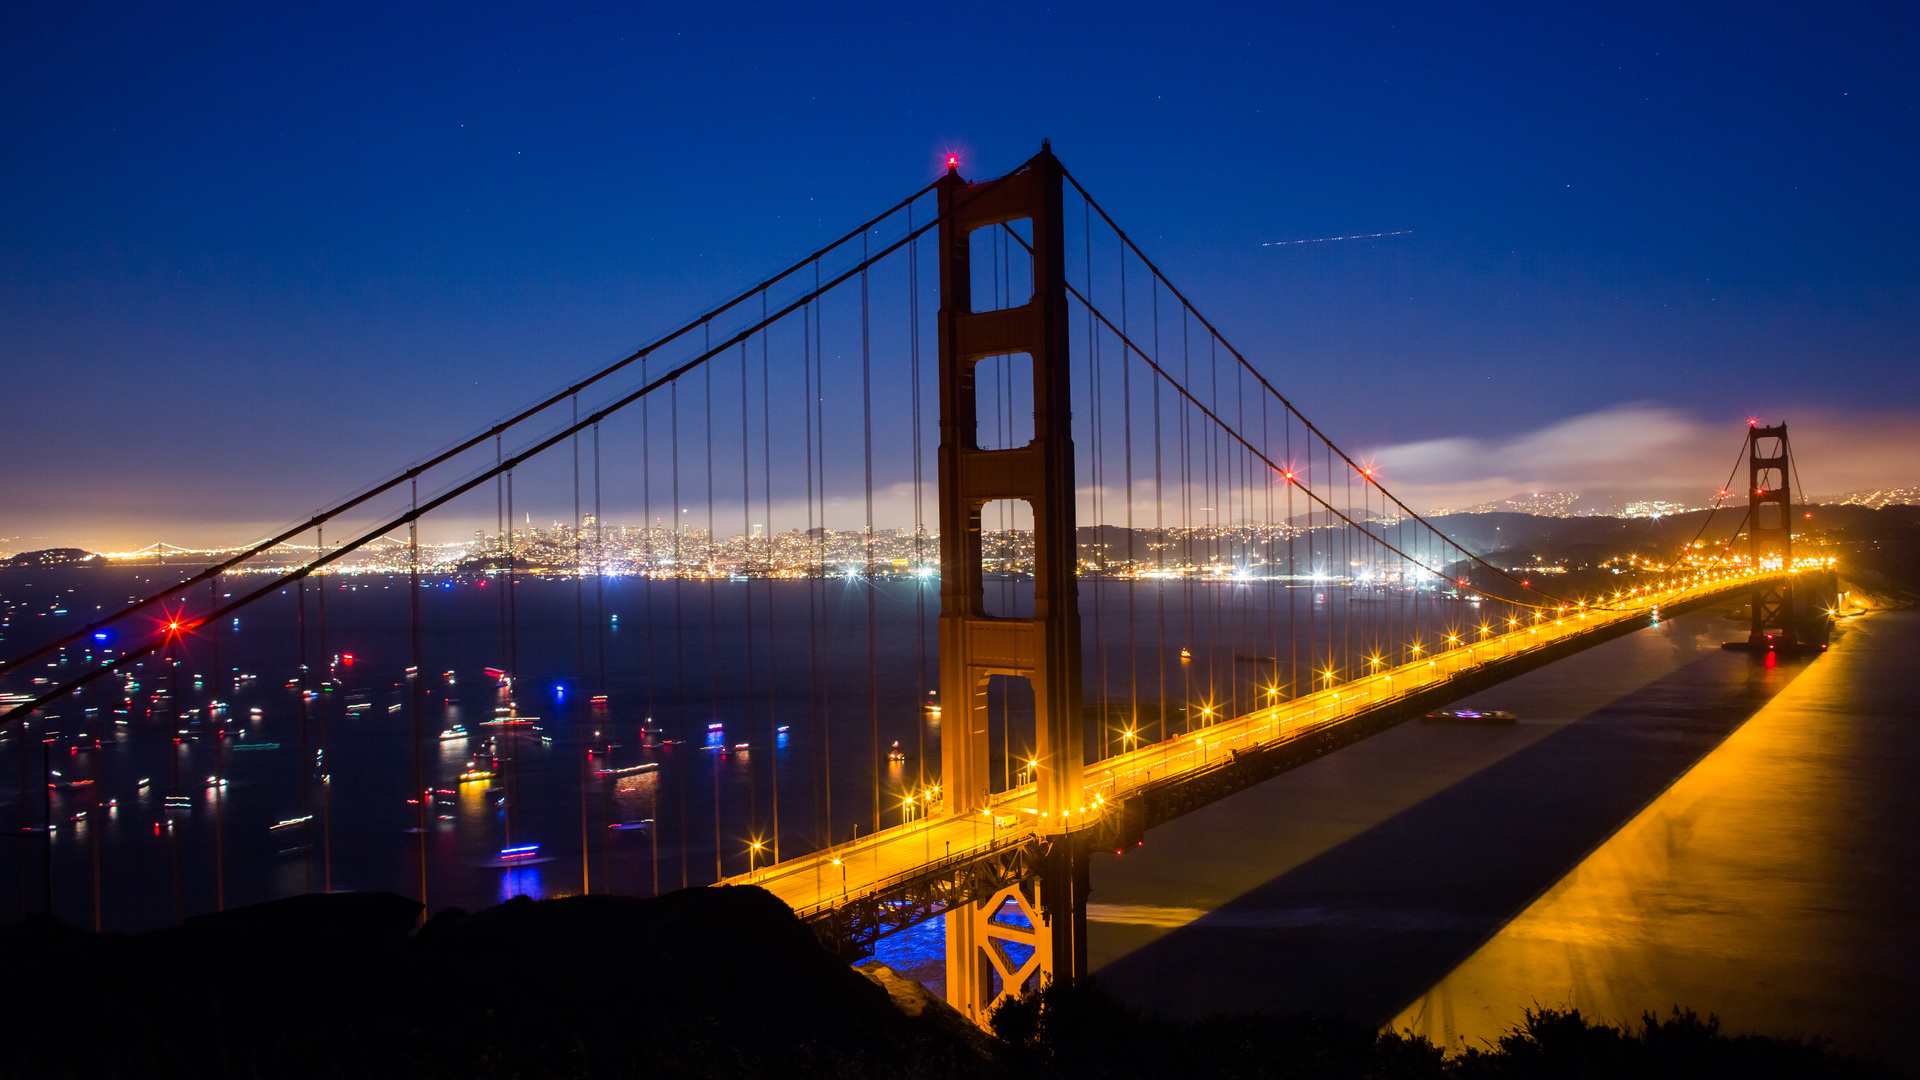 1920x1080 Golden Gate Nights World 5k Laptop Full Hd 1080p Hd 4k